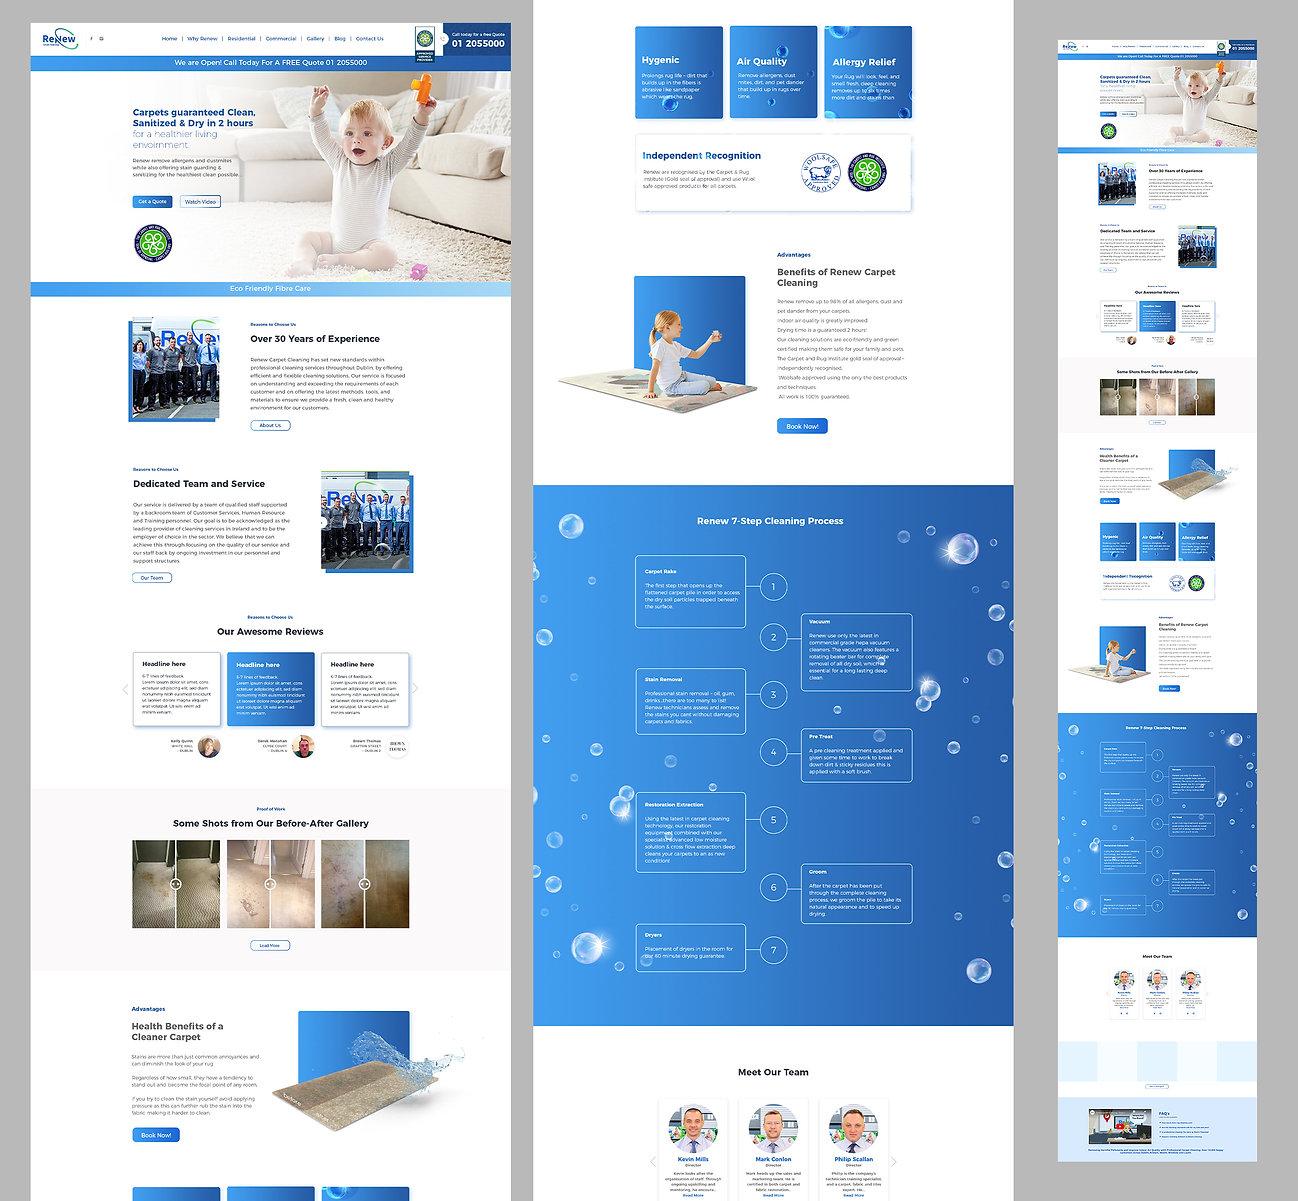 website-redesign-preview-04.jpg